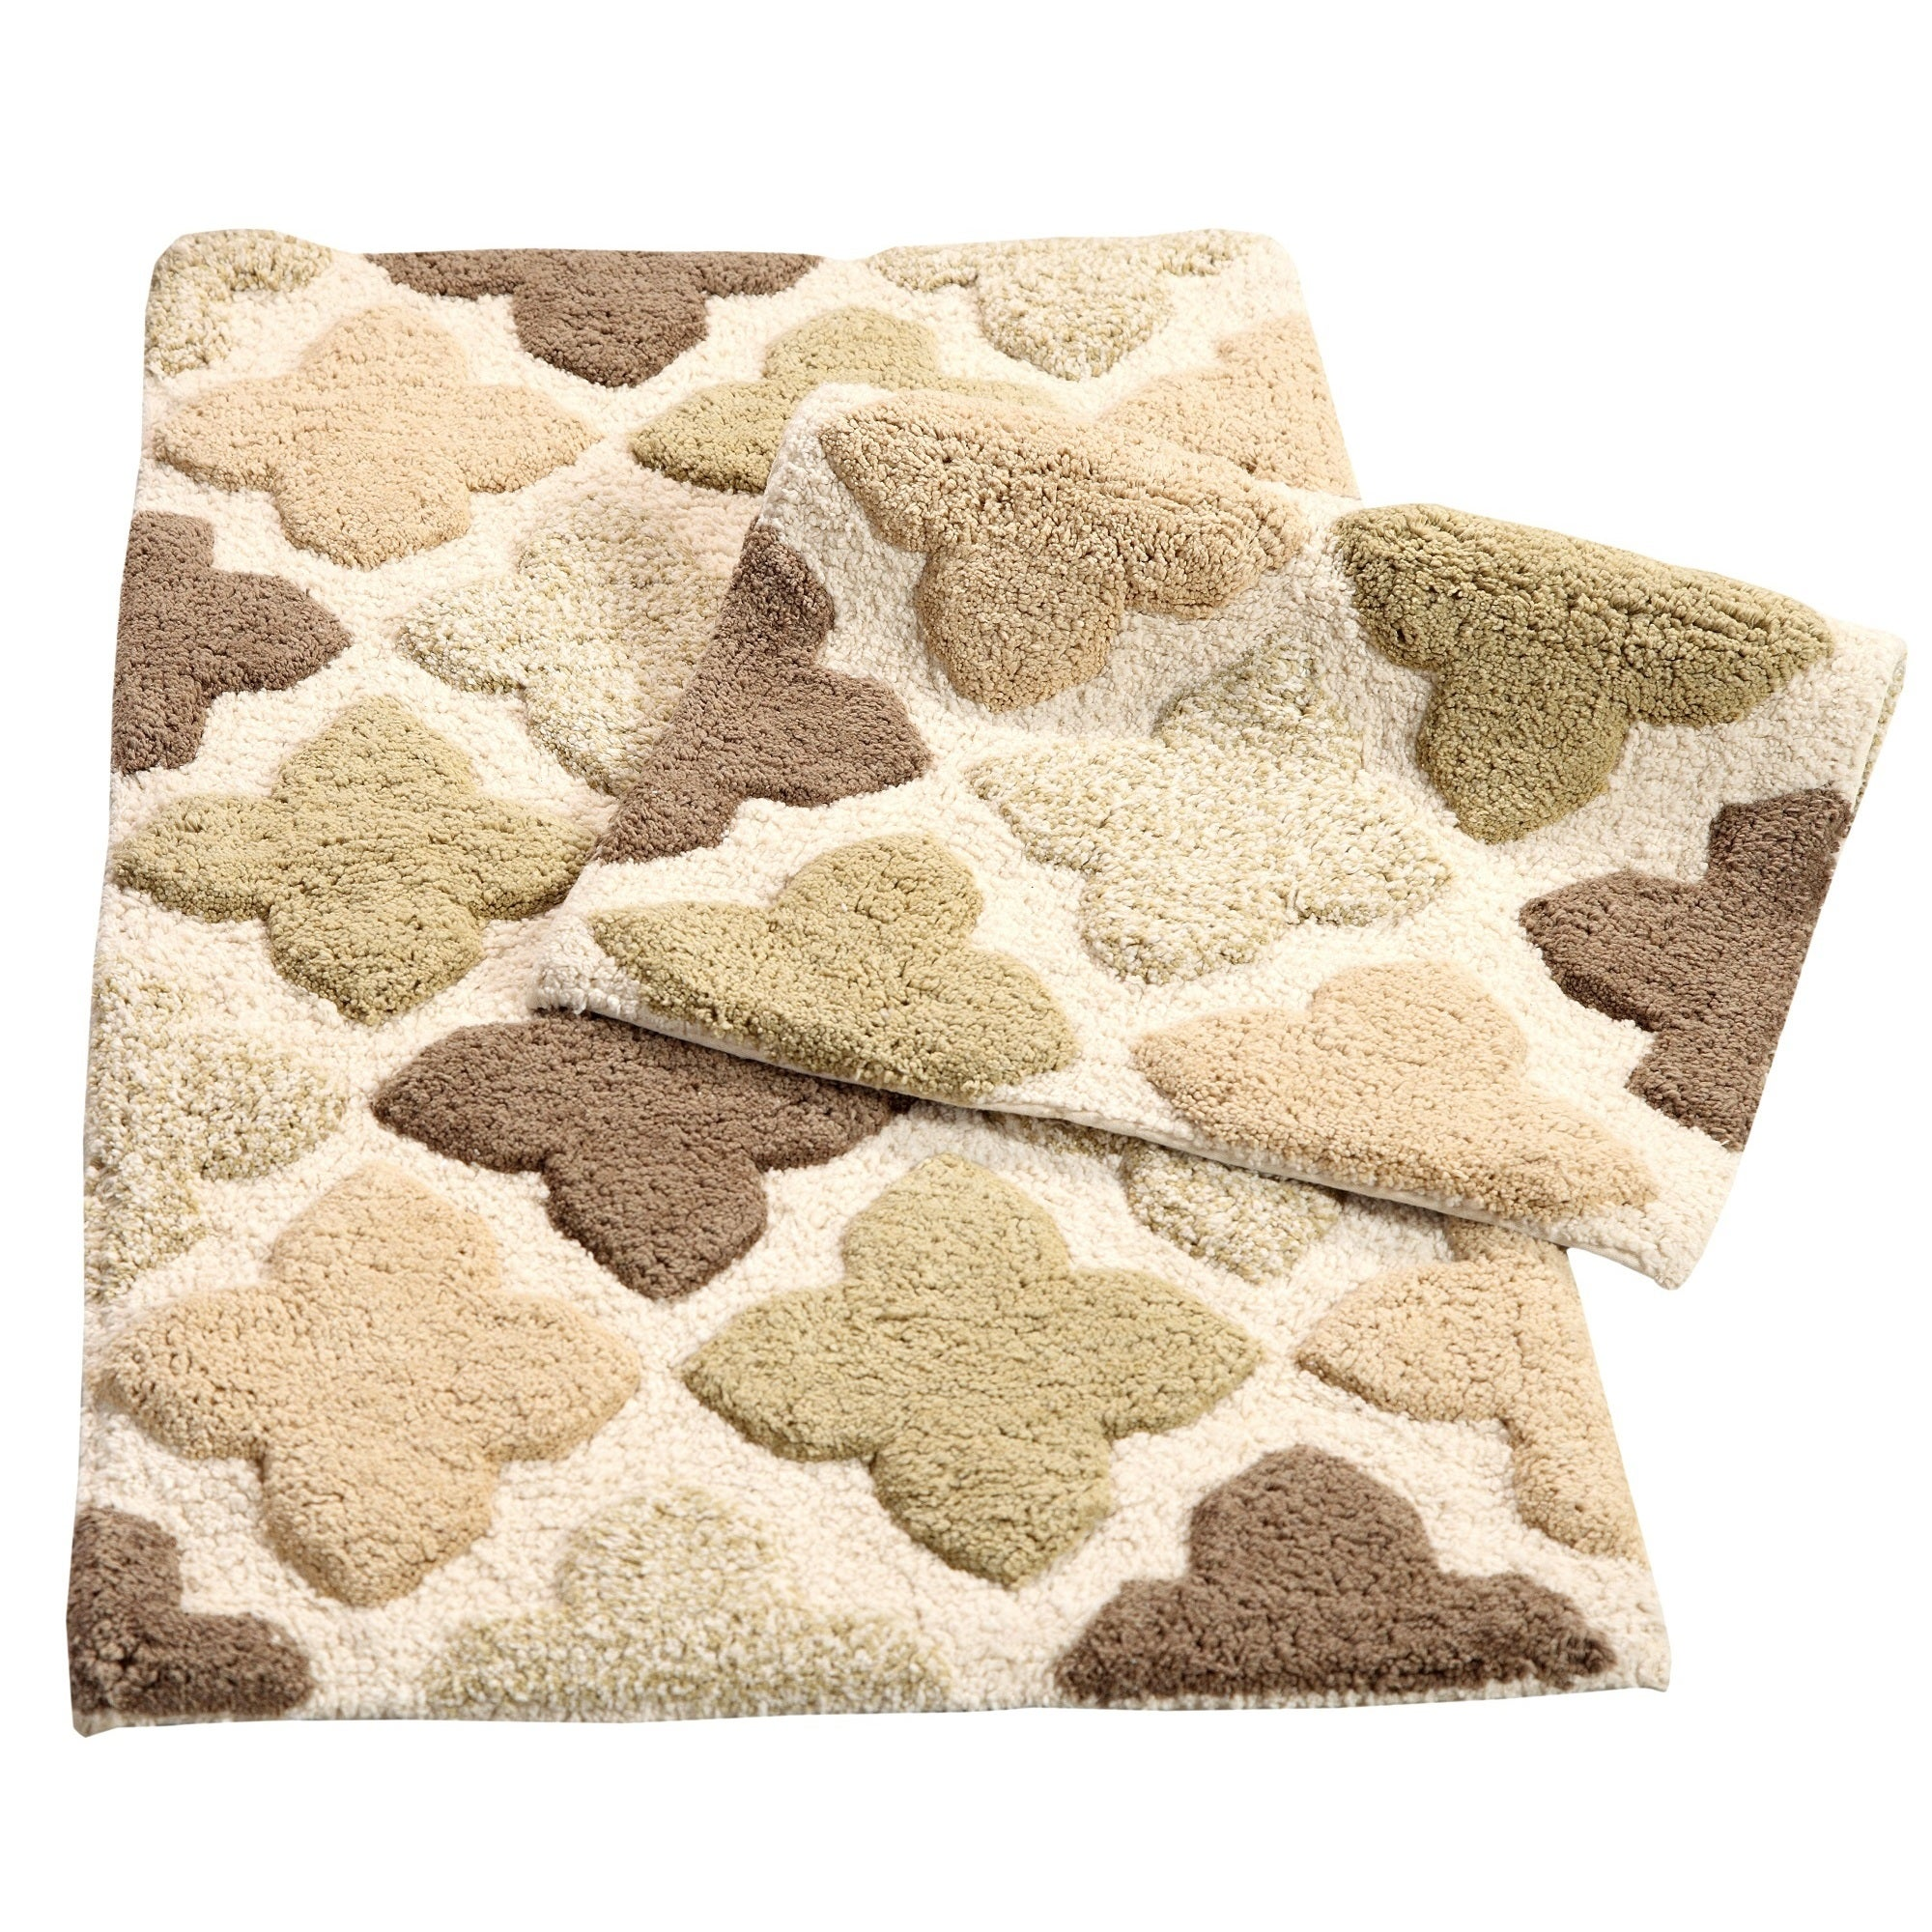 luxury rug sets set image of for comfort bathroom piece